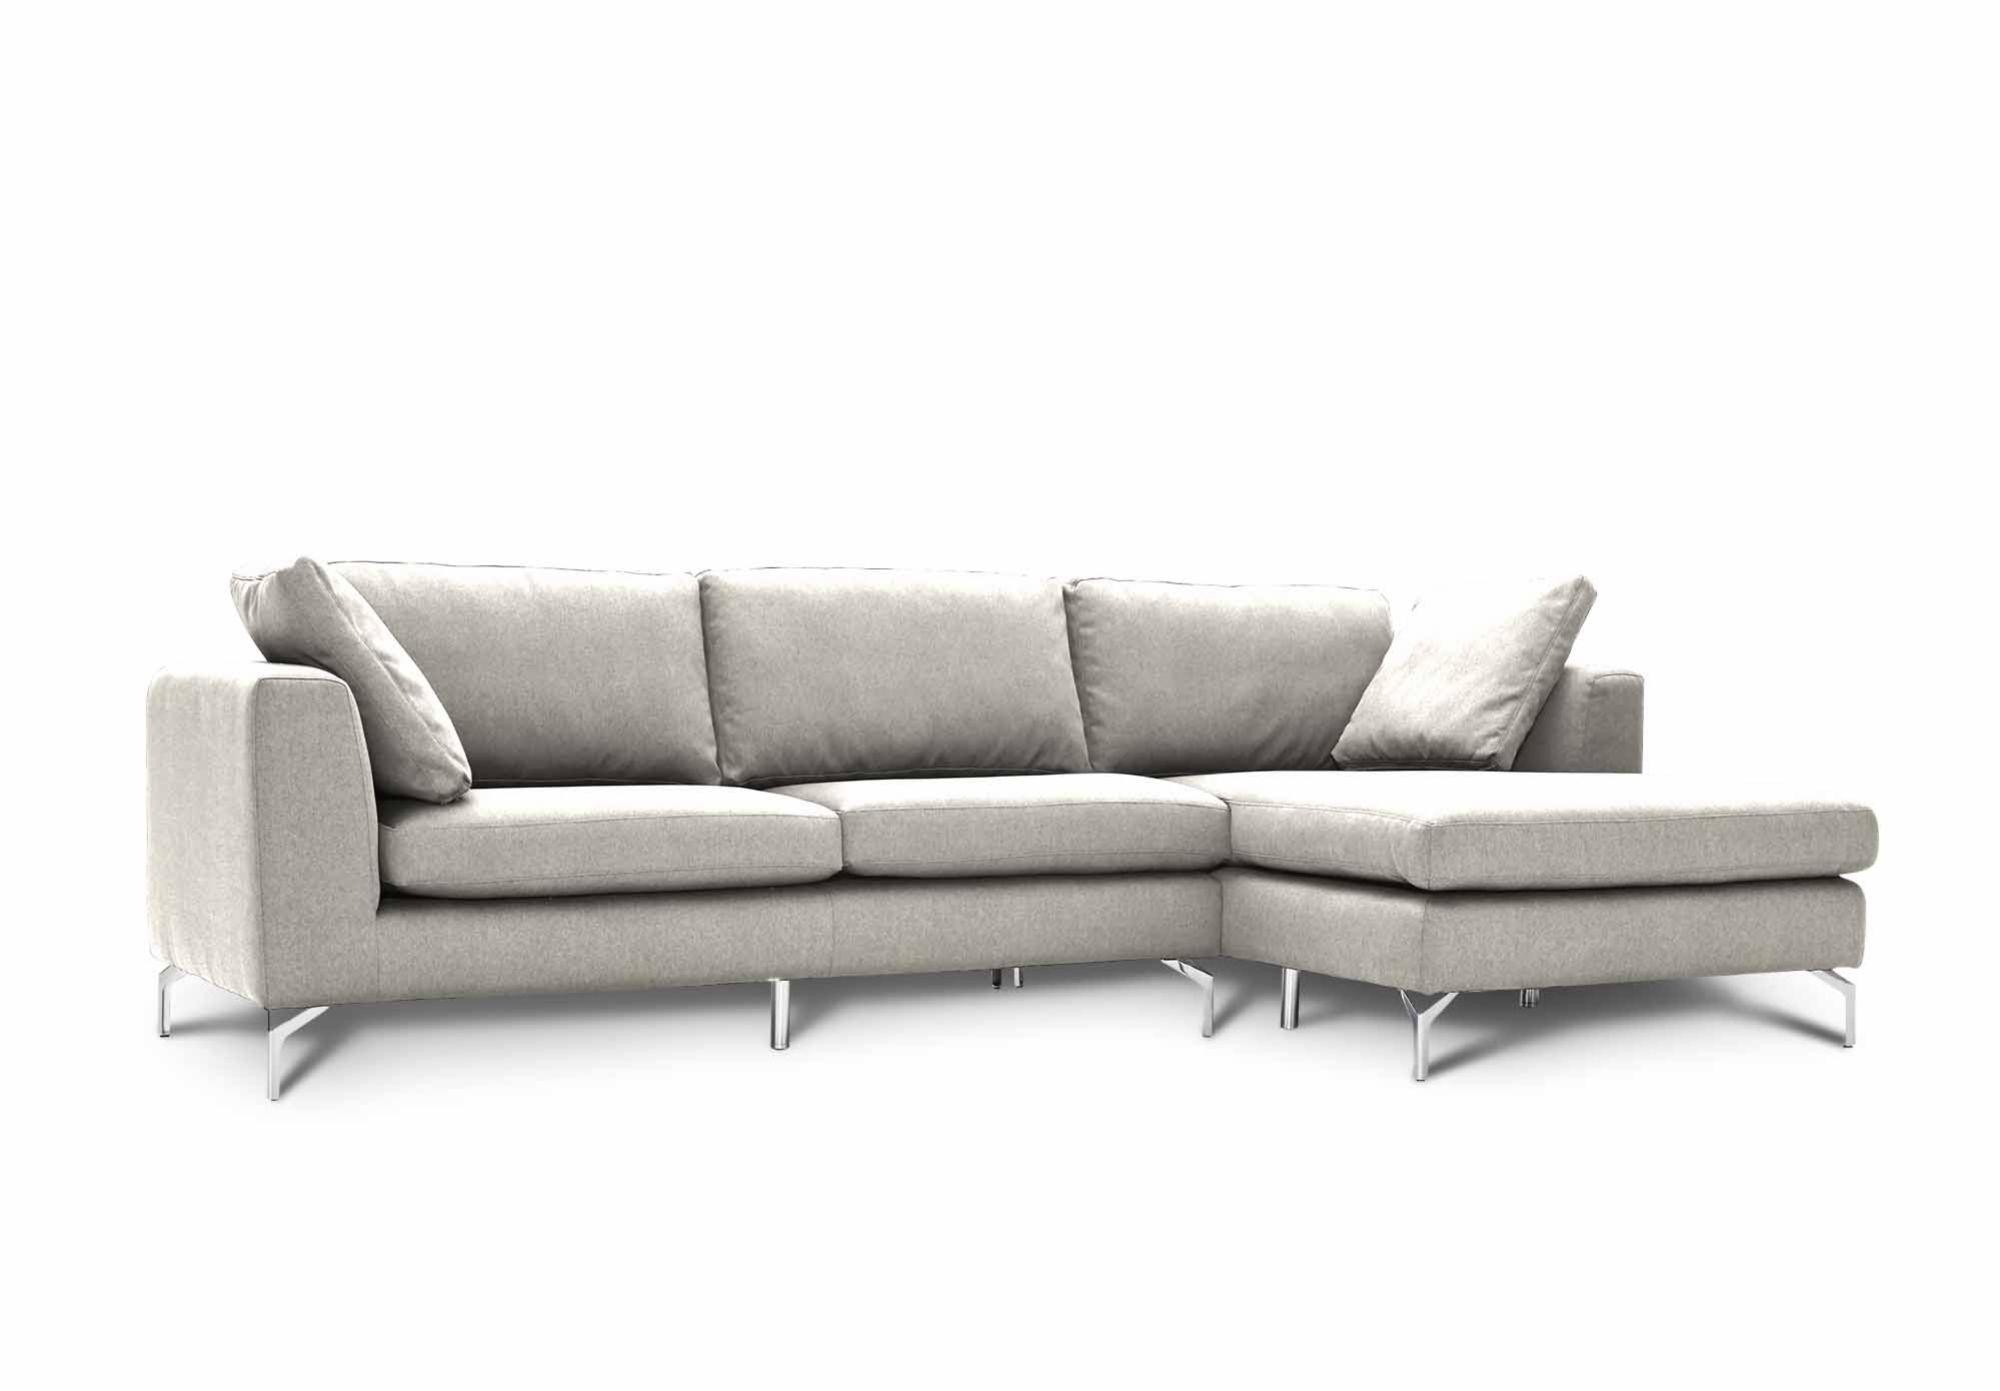 Sensational Apex Rhf Chaise Sofa Furniture Village Sale Price 1095 Lamtechconsult Wood Chair Design Ideas Lamtechconsultcom